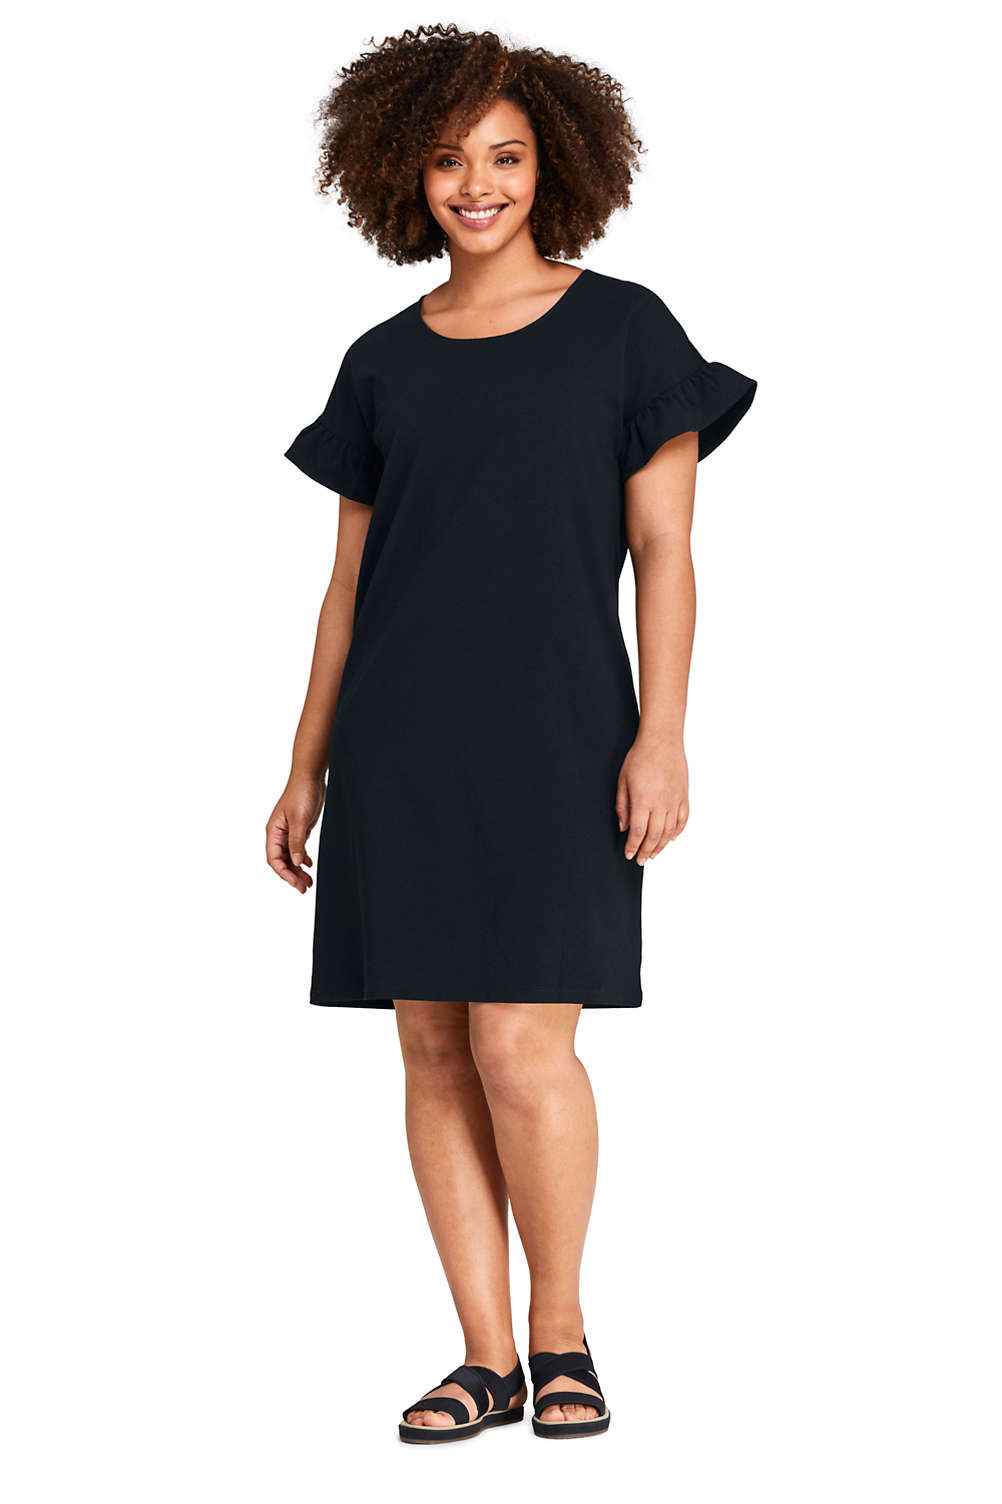 940dae19a32 Women s Plus Size Short Sleeve Ruffle Knit Tee Shirt Dress. Item   508339AH0. View Fullscreen